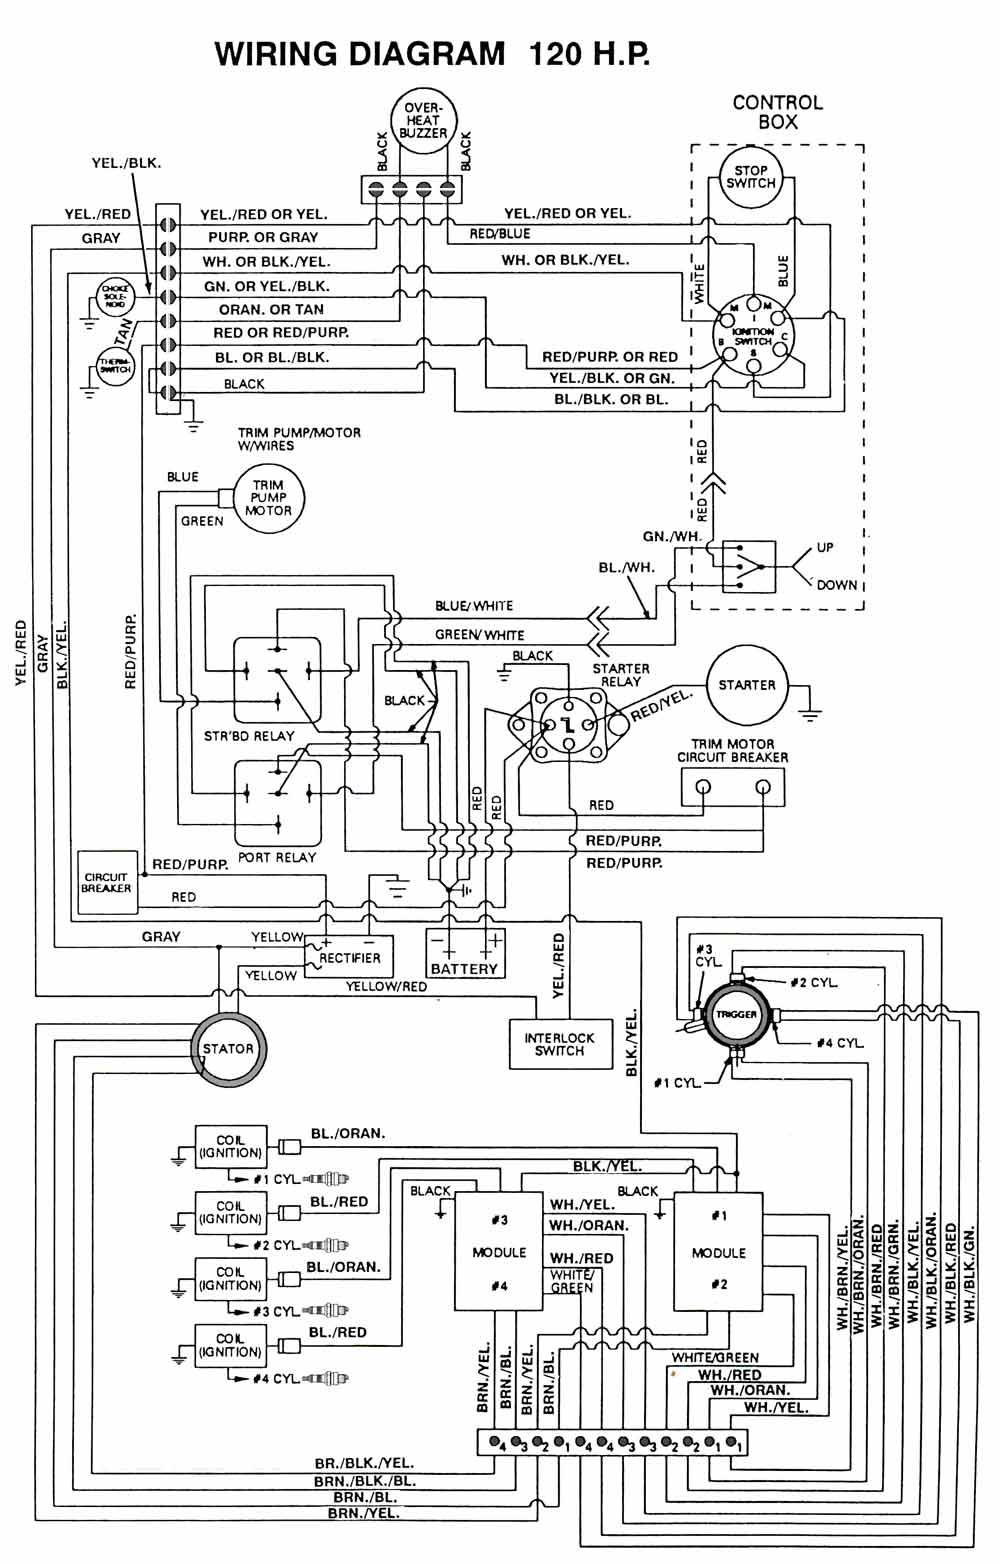 1986 bayliner capri wiring diagram fight or flight response chrysler outboard diagrams mastertech marine force 120 hp thru 1991a models engine